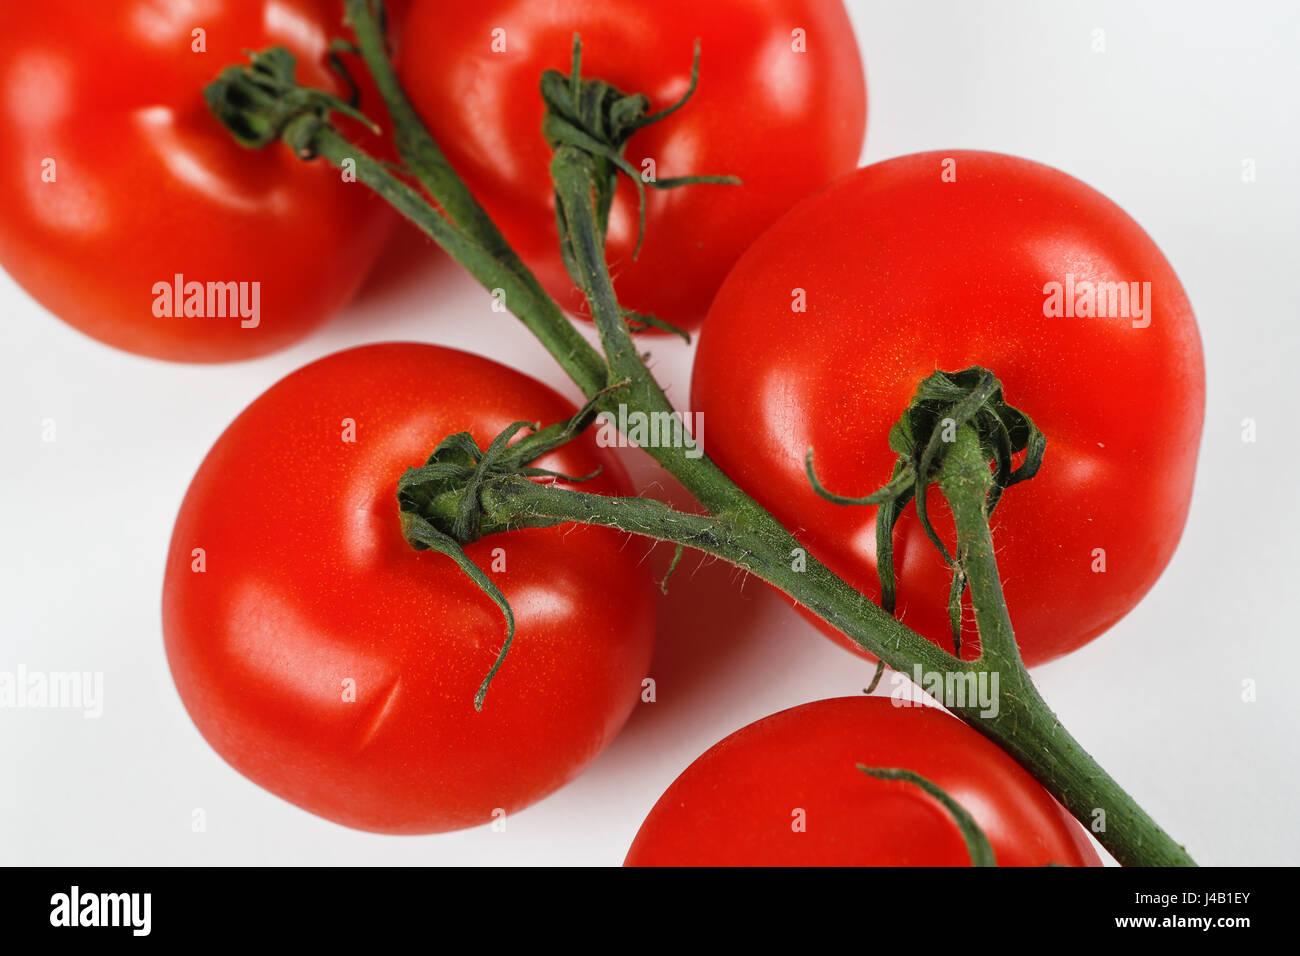 Bio-Tomaten. Lebensmittelkonzepte. Tomaten. Illustrativ Stockfoto